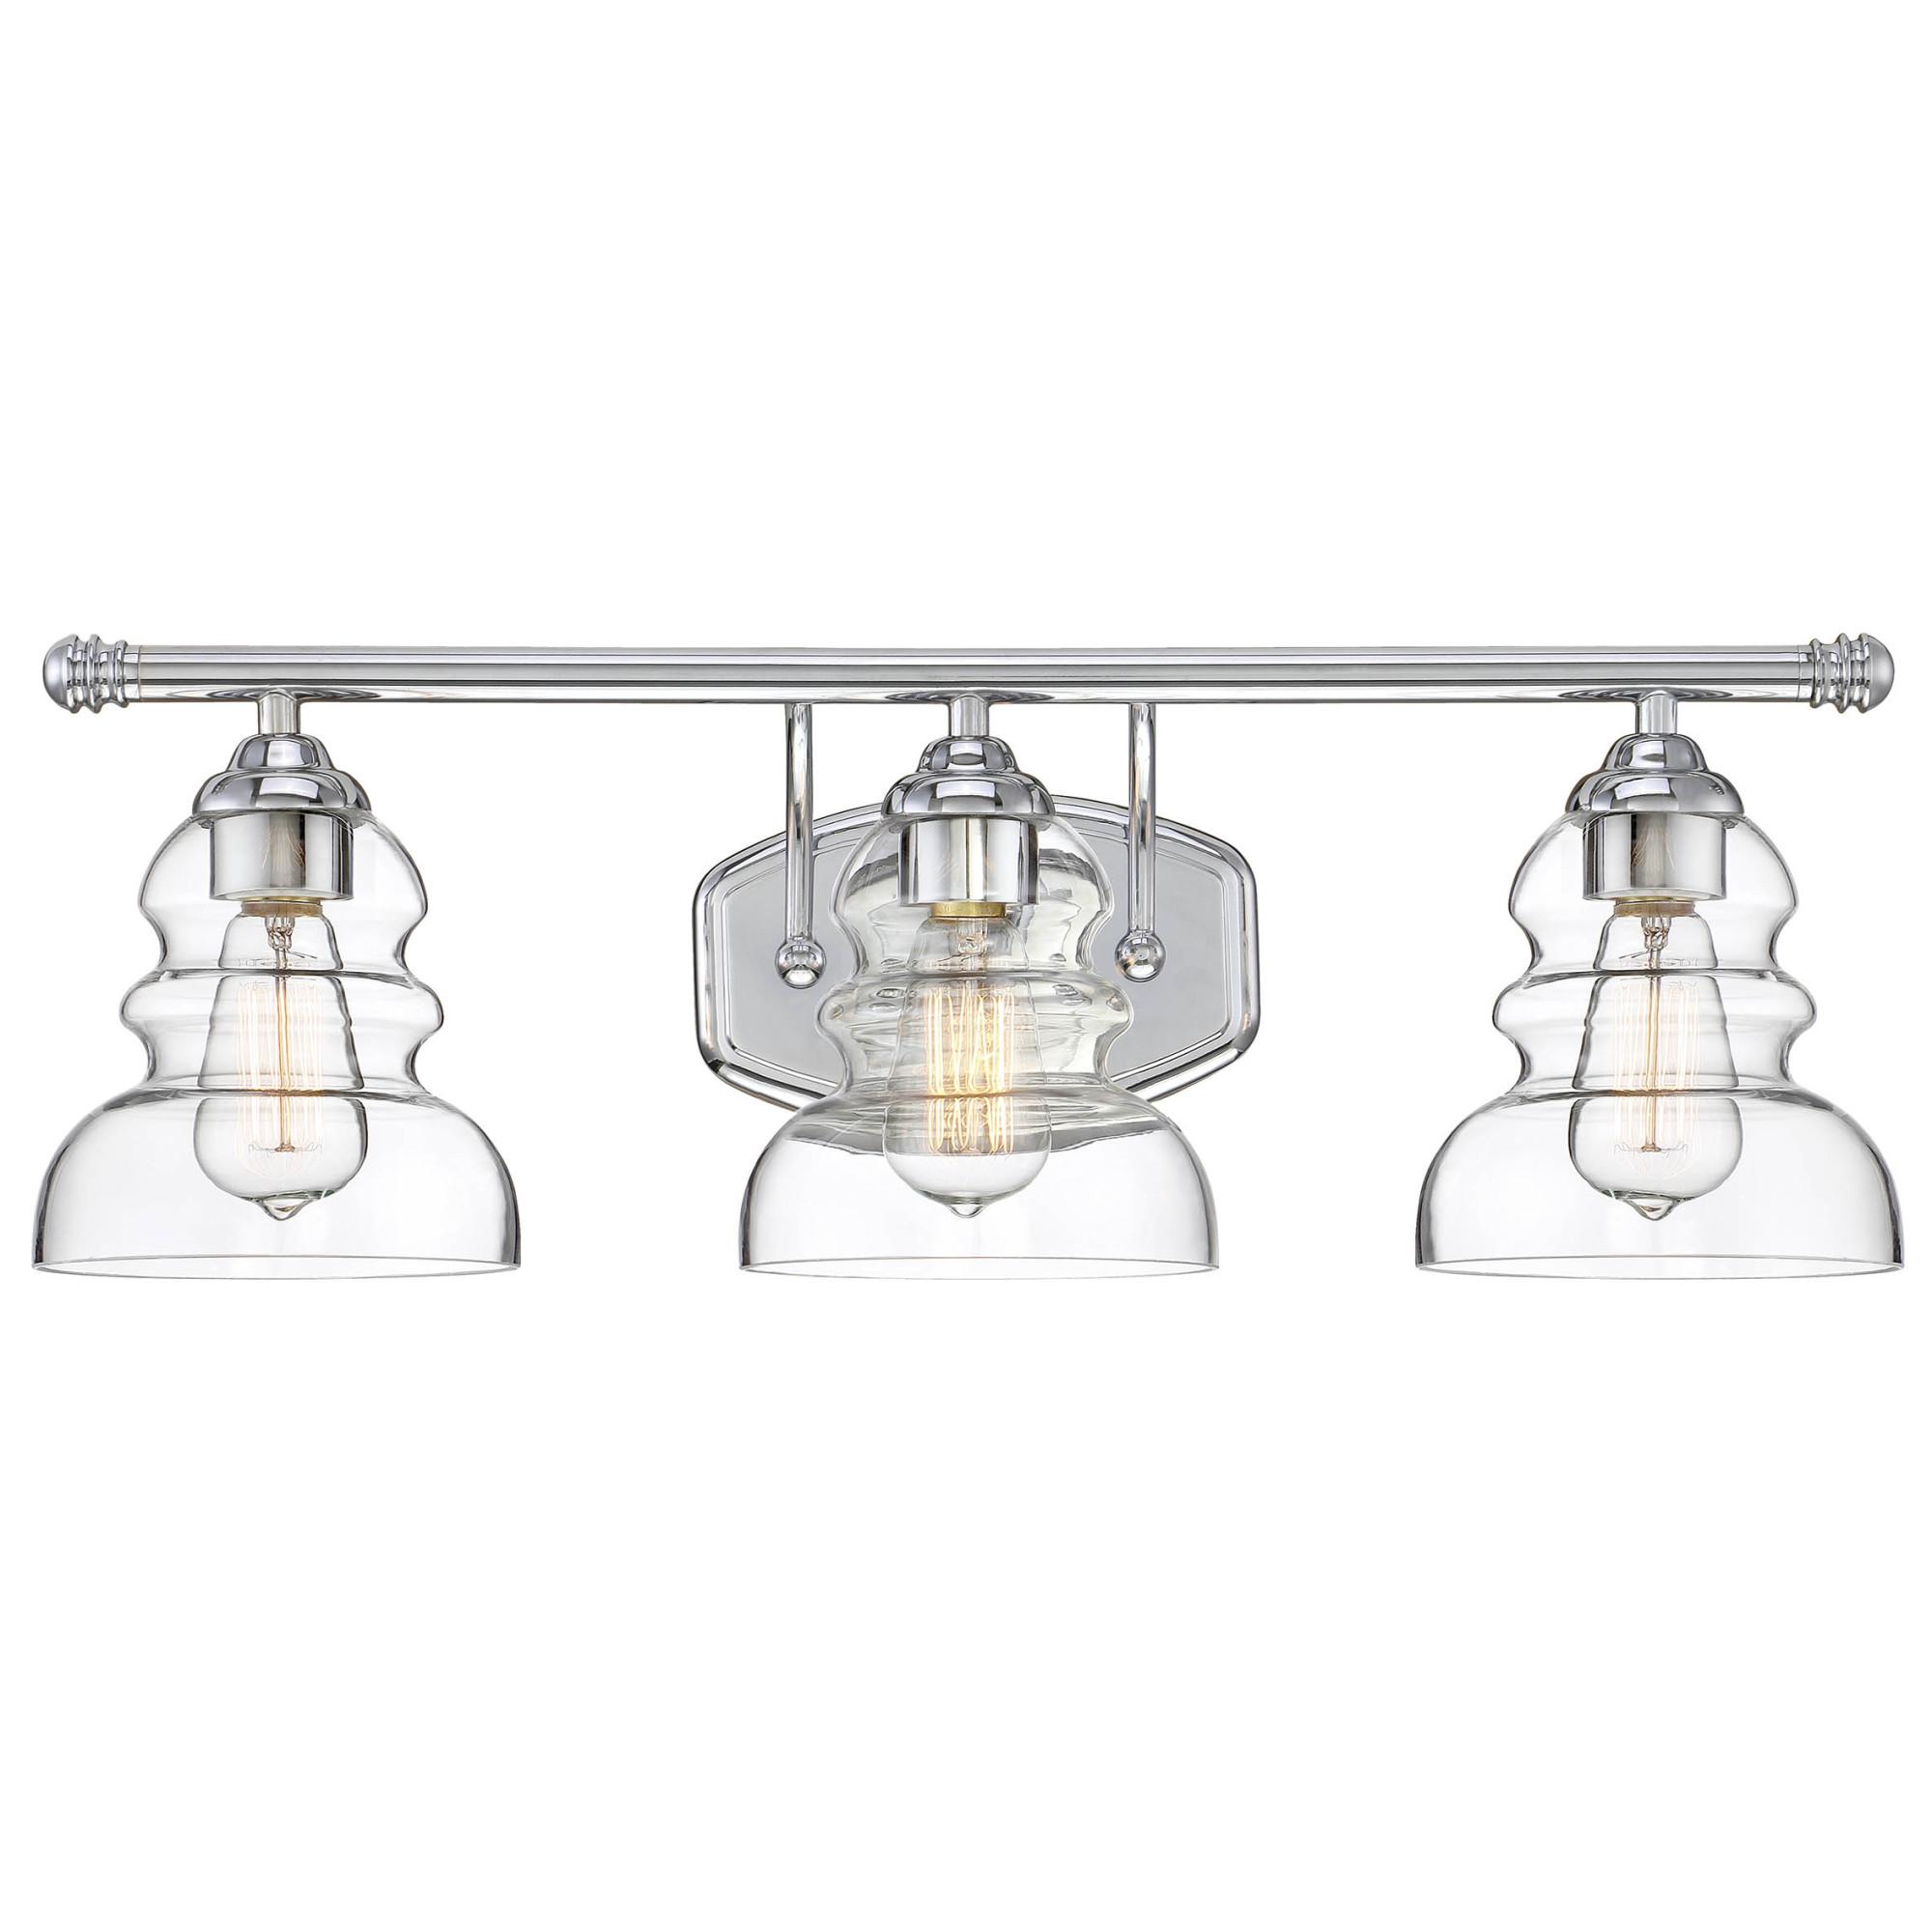 Details About Millennium Lighting 7333 Brighton 3 Light 24 W Bathroom Vanity Chrome